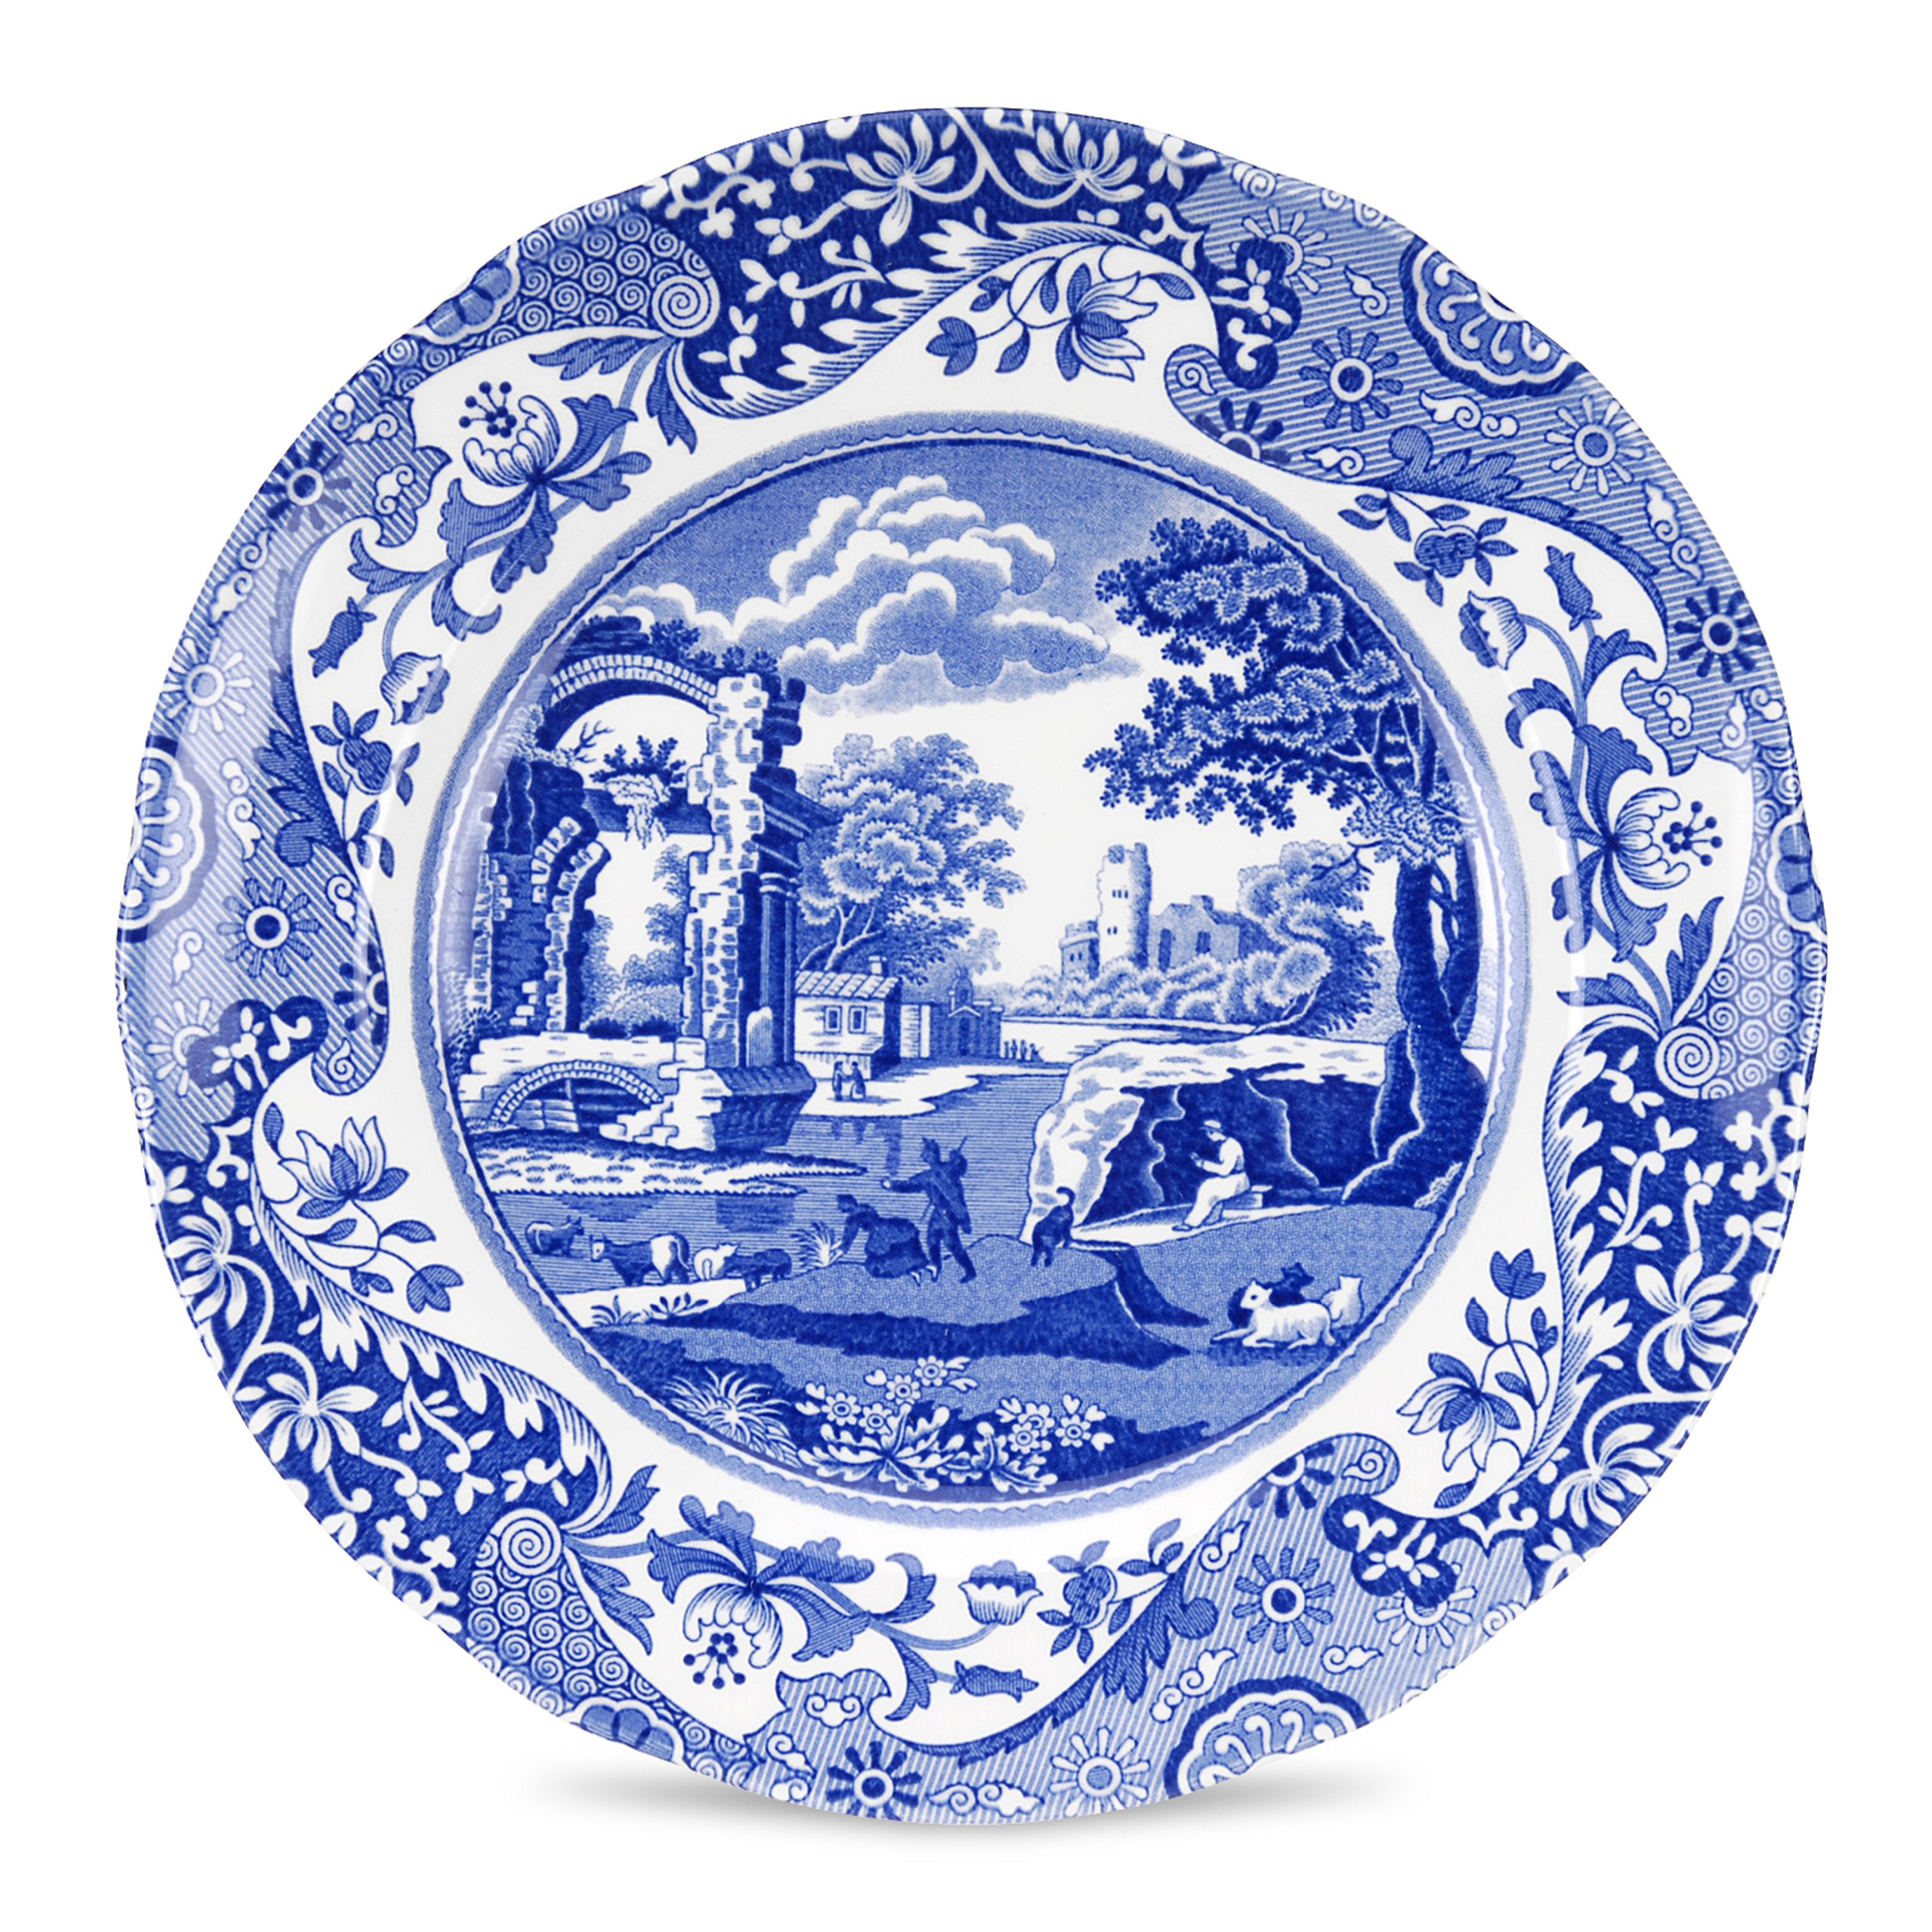 Spode 749151489653 Blue Italian Salad Plate, Blue/White, 8''